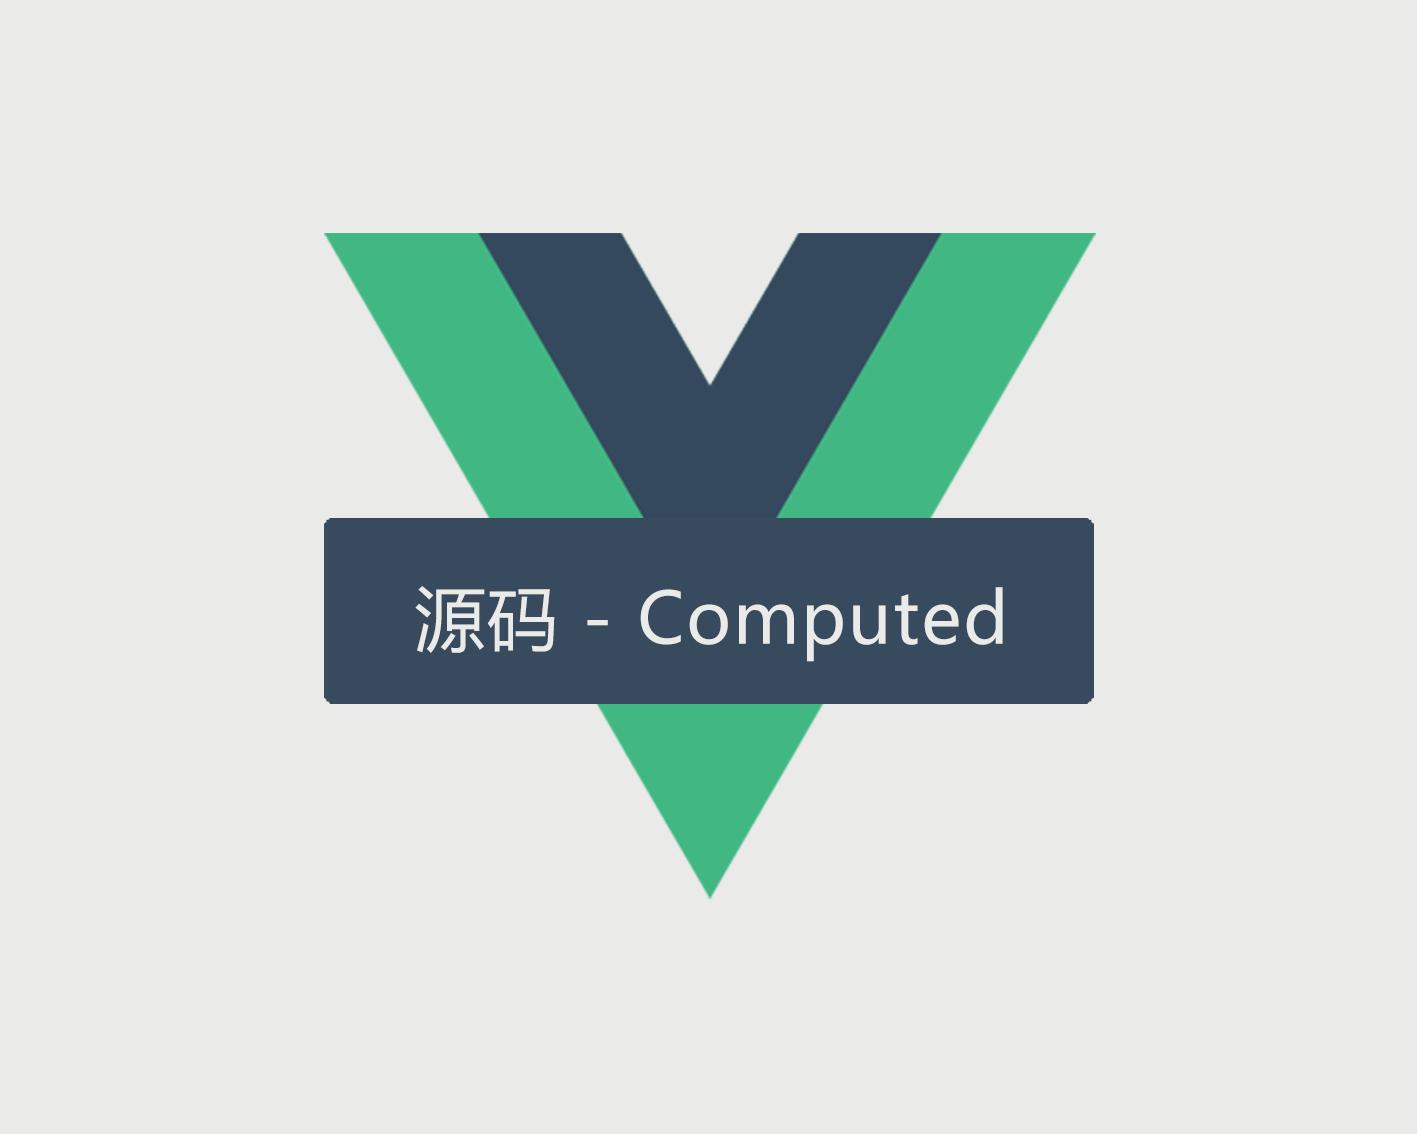 【Vue原理】Computed - 源码版